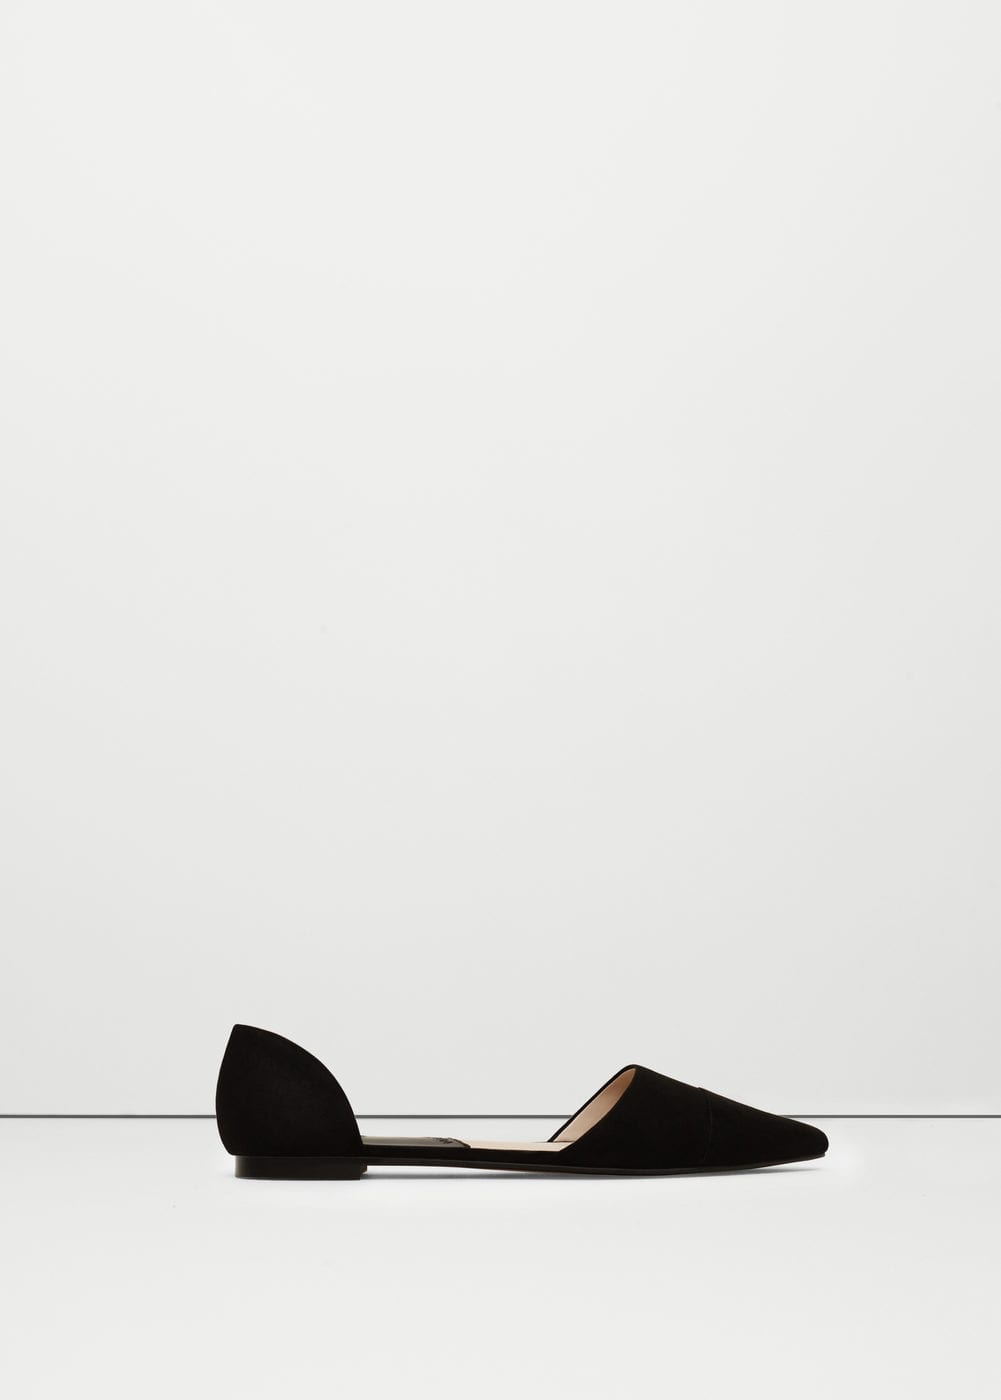 Mango Pointed Toe Flats $29.99